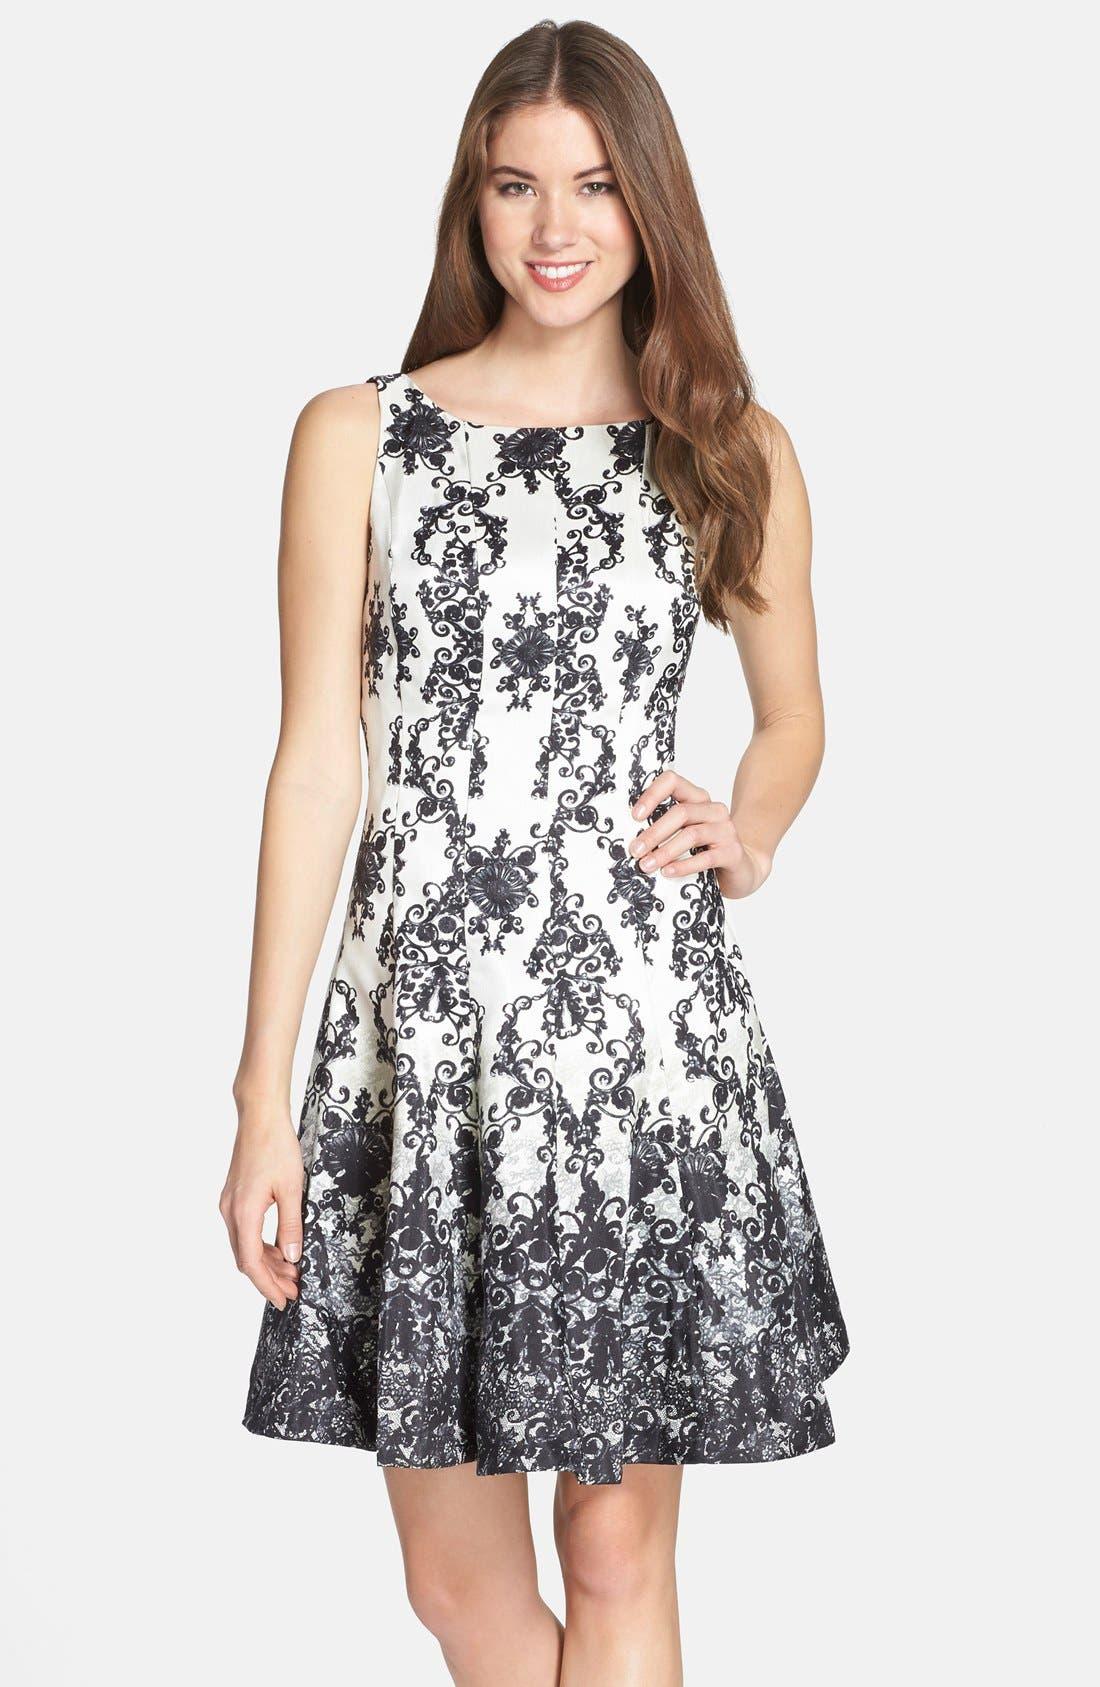 Alternate Image 1 Selected - Taylor Dresses Print Shantung Fit & Flare Dress (Regular & Petite)